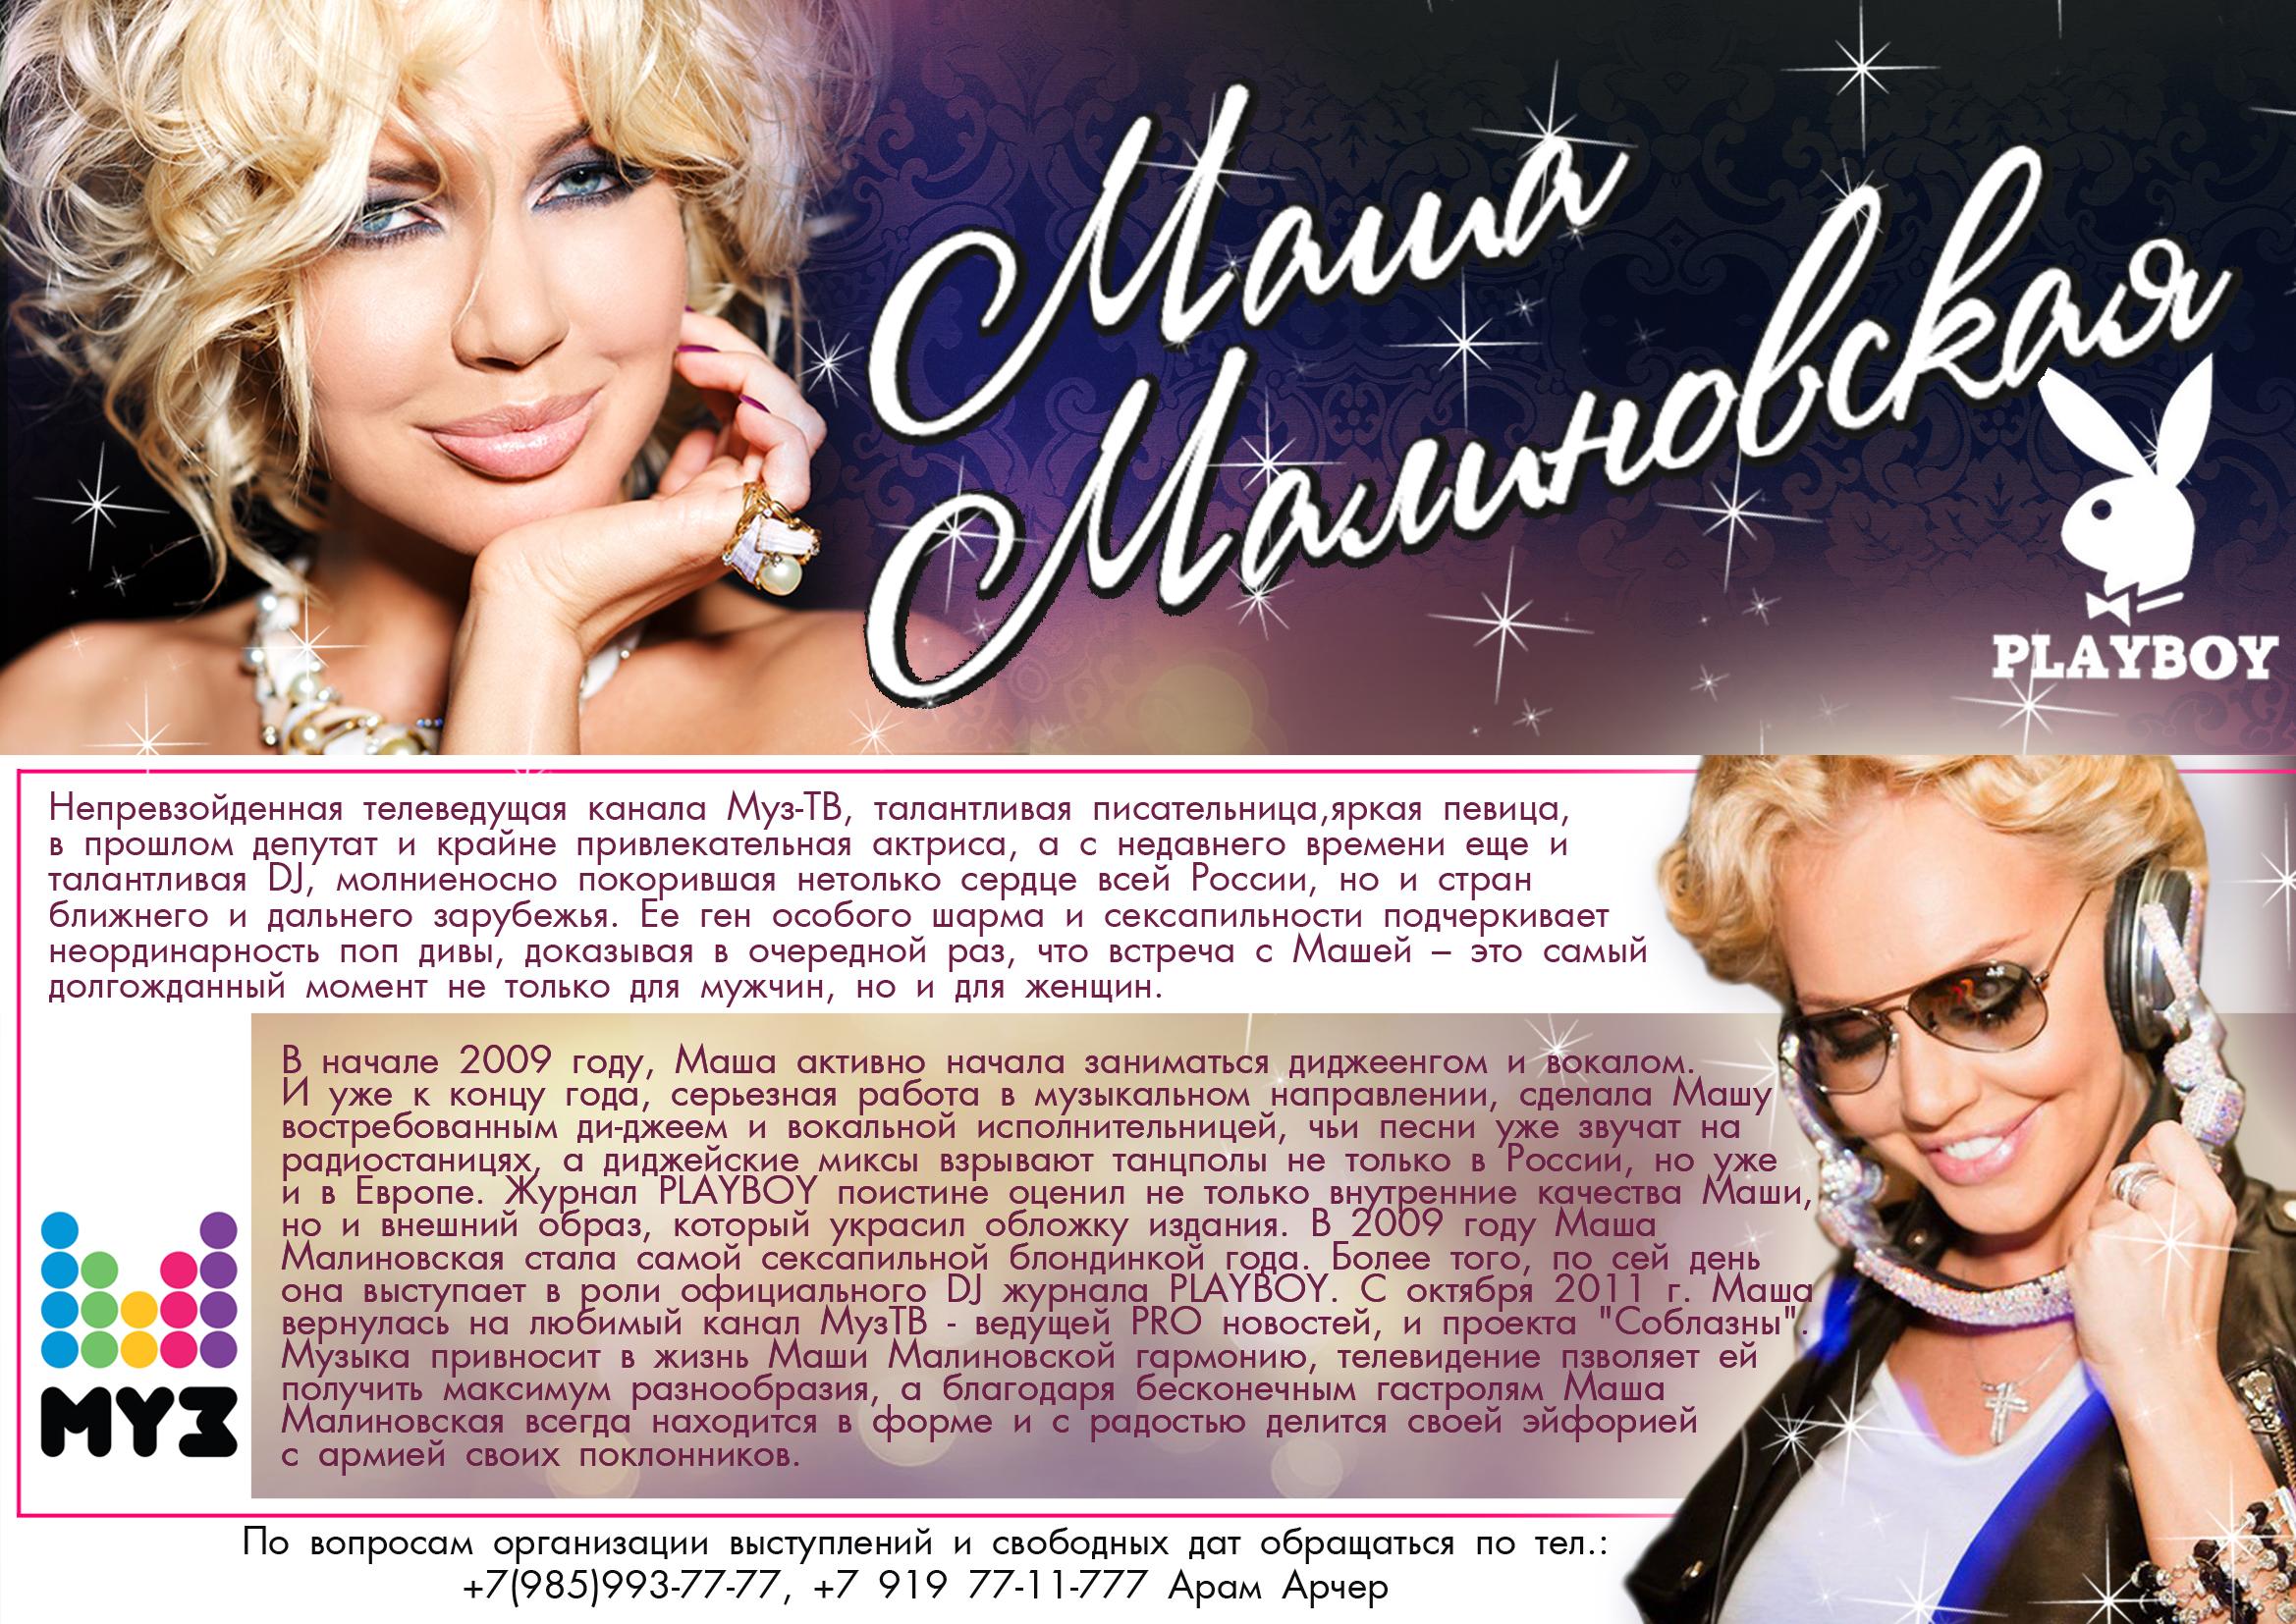 Hot Masha Malinovskaya naked (66 photo), Pussy, Paparazzi, Selfie, swimsuit 2017